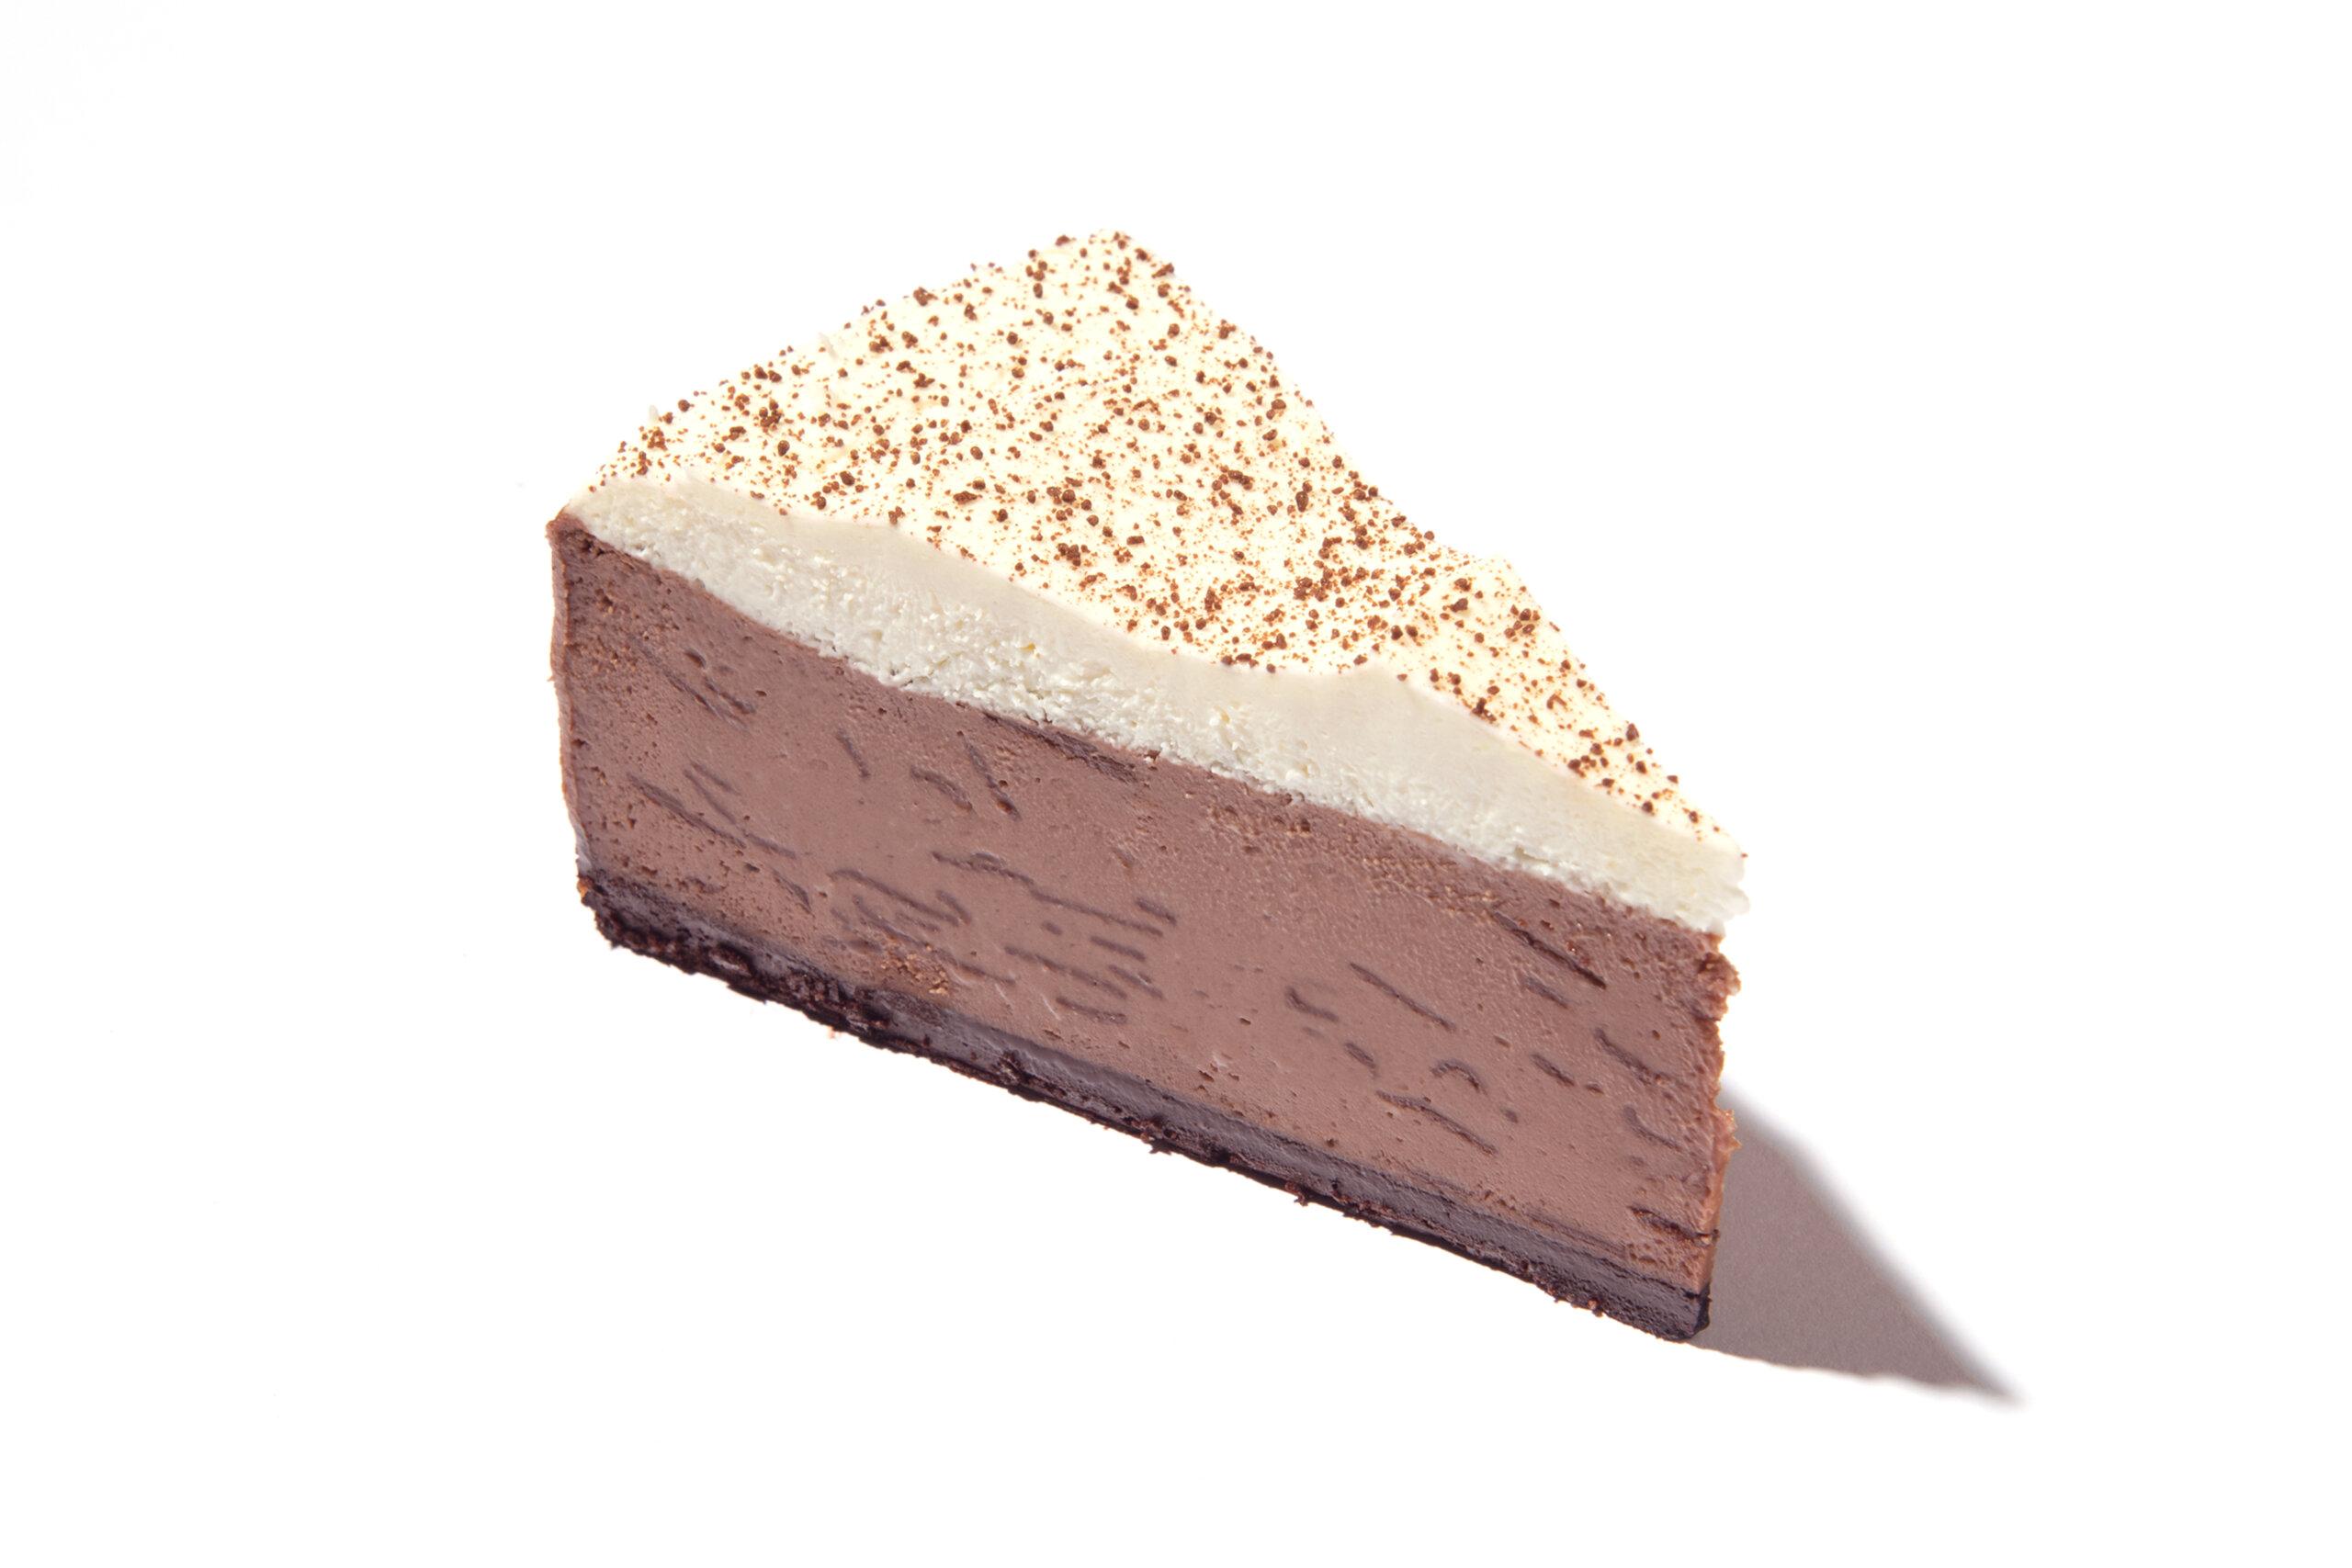 A slice of Eli's Hot Chocolate Cheesecake